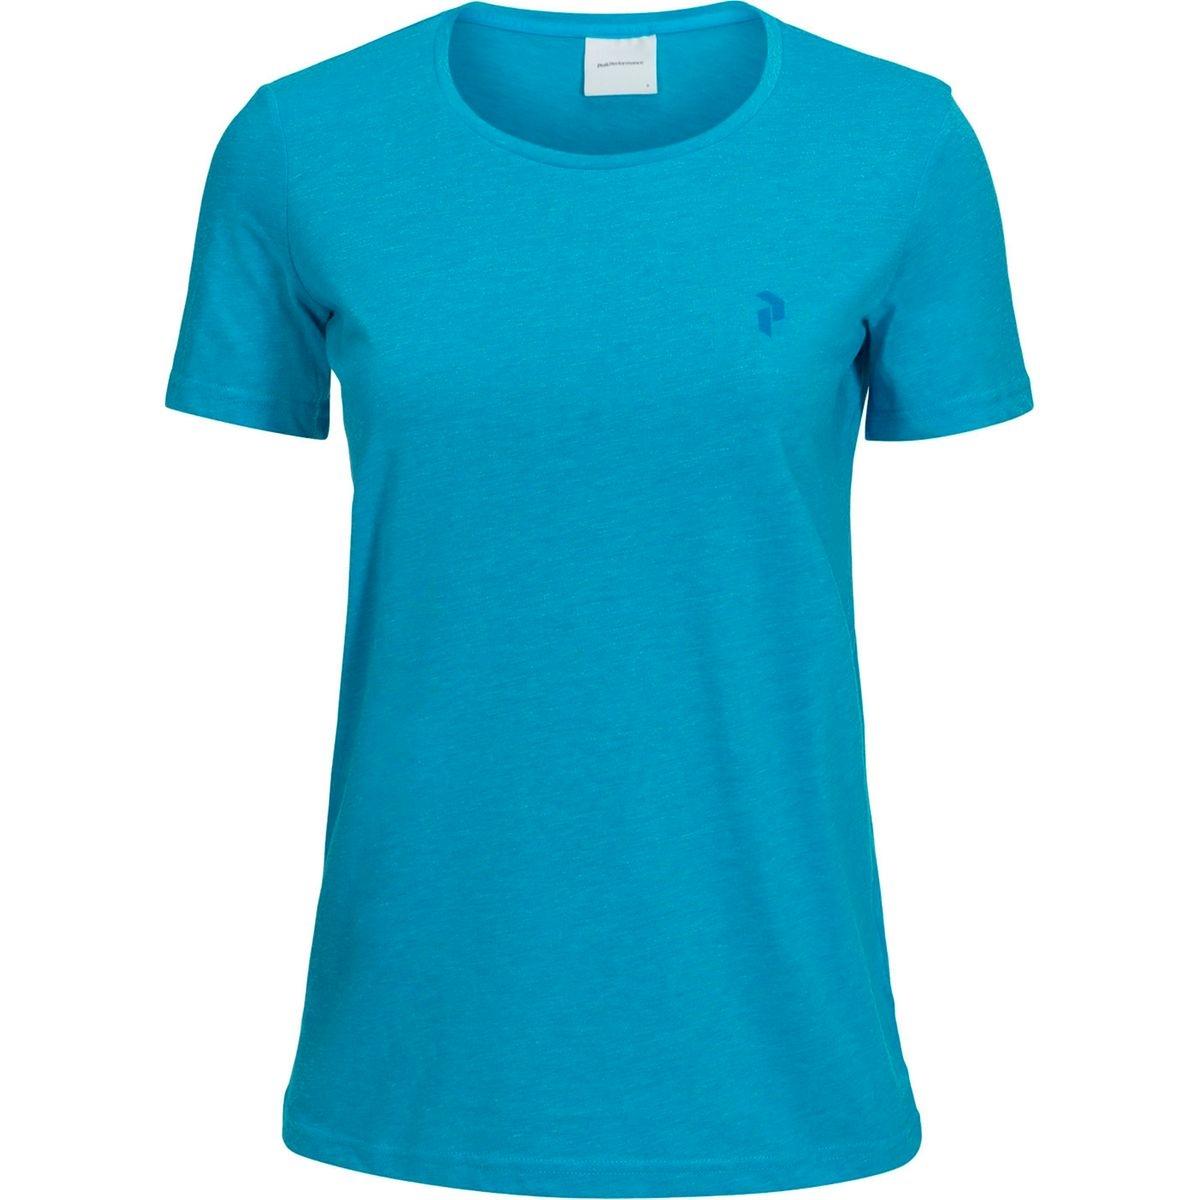 48cbf7da0a4 Track - T-shirt manches courtes Femme - bleu. PEAK PERFORMANCE